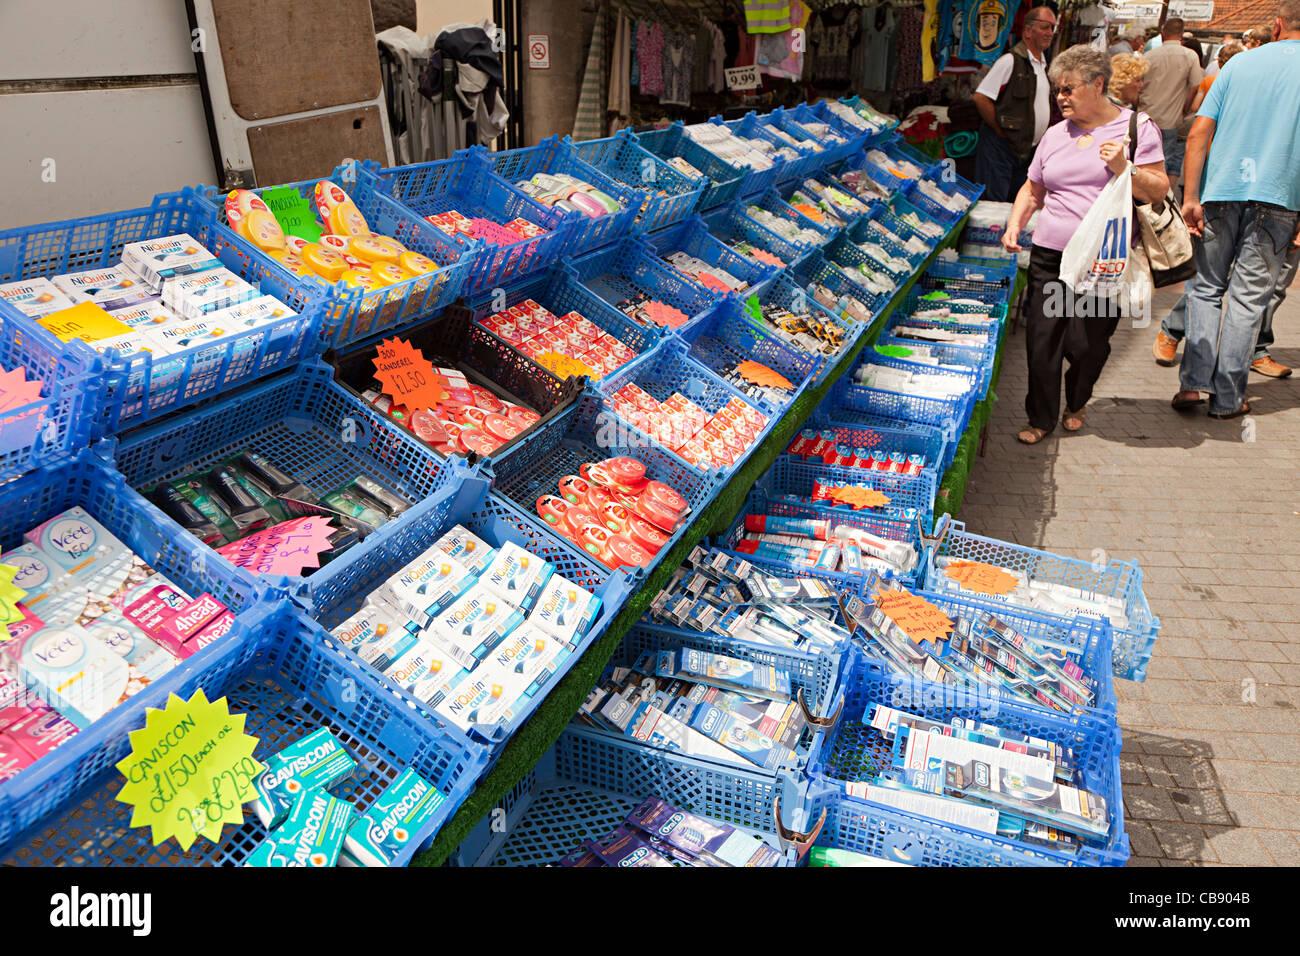 Kunststoff-Kisten mit Billigprodukten auf im freien Markt Abergavenny Wales UK Stockbild